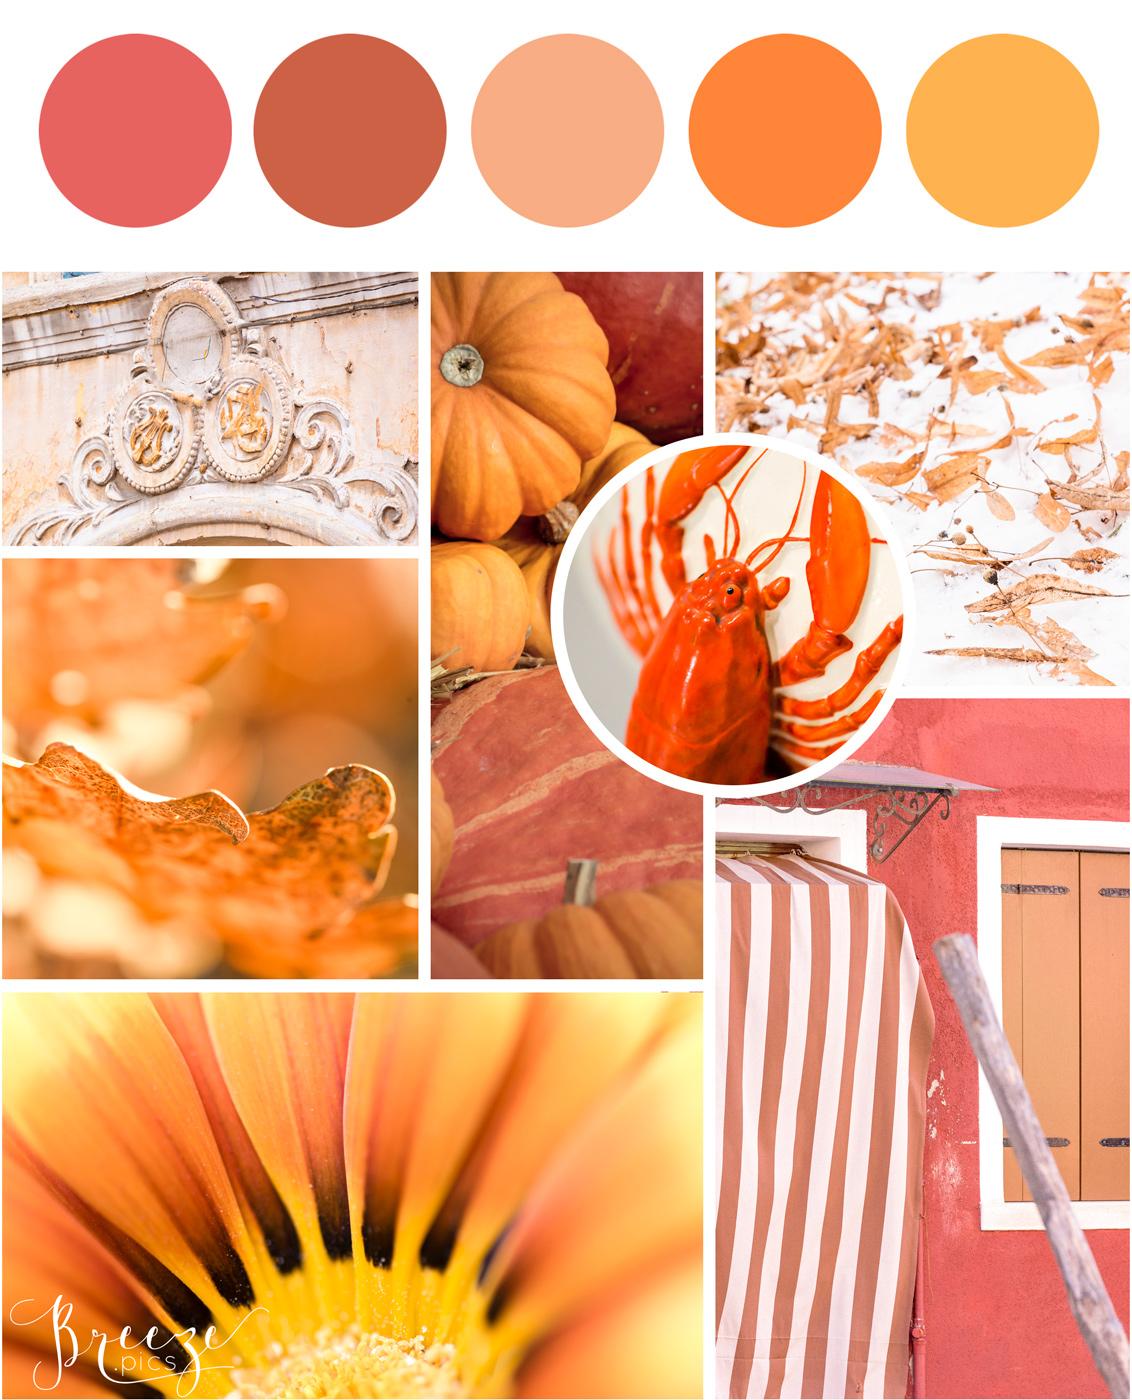 Orange mood board, creating a sanctuary at home, Breeze Pics